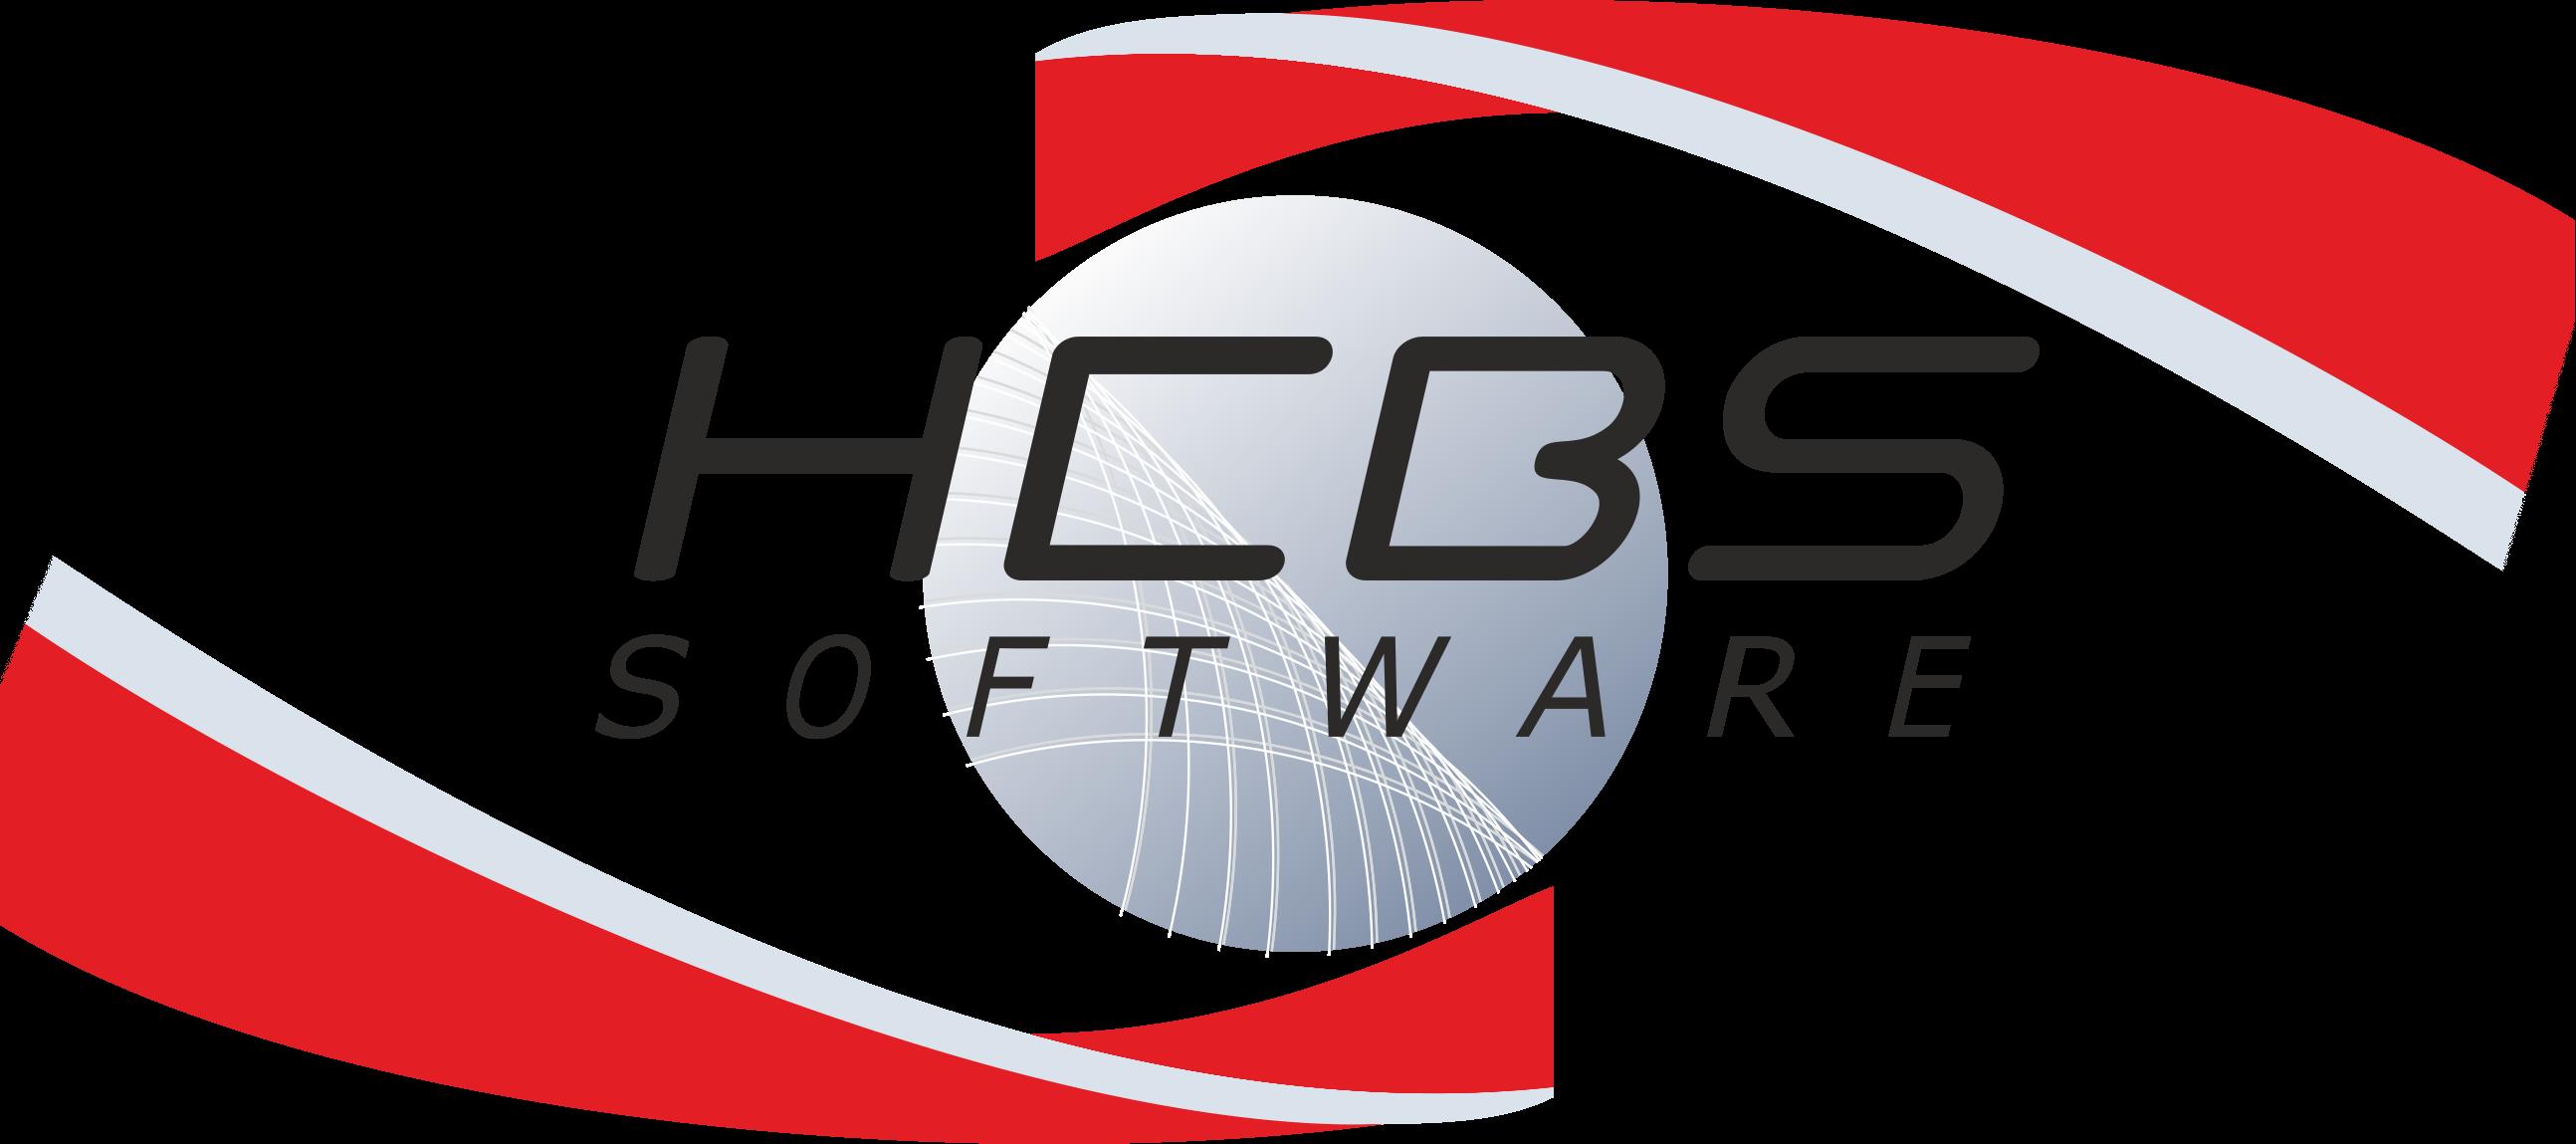 HCBS Software - Inh.Gabriele Hillebrandt e.K.